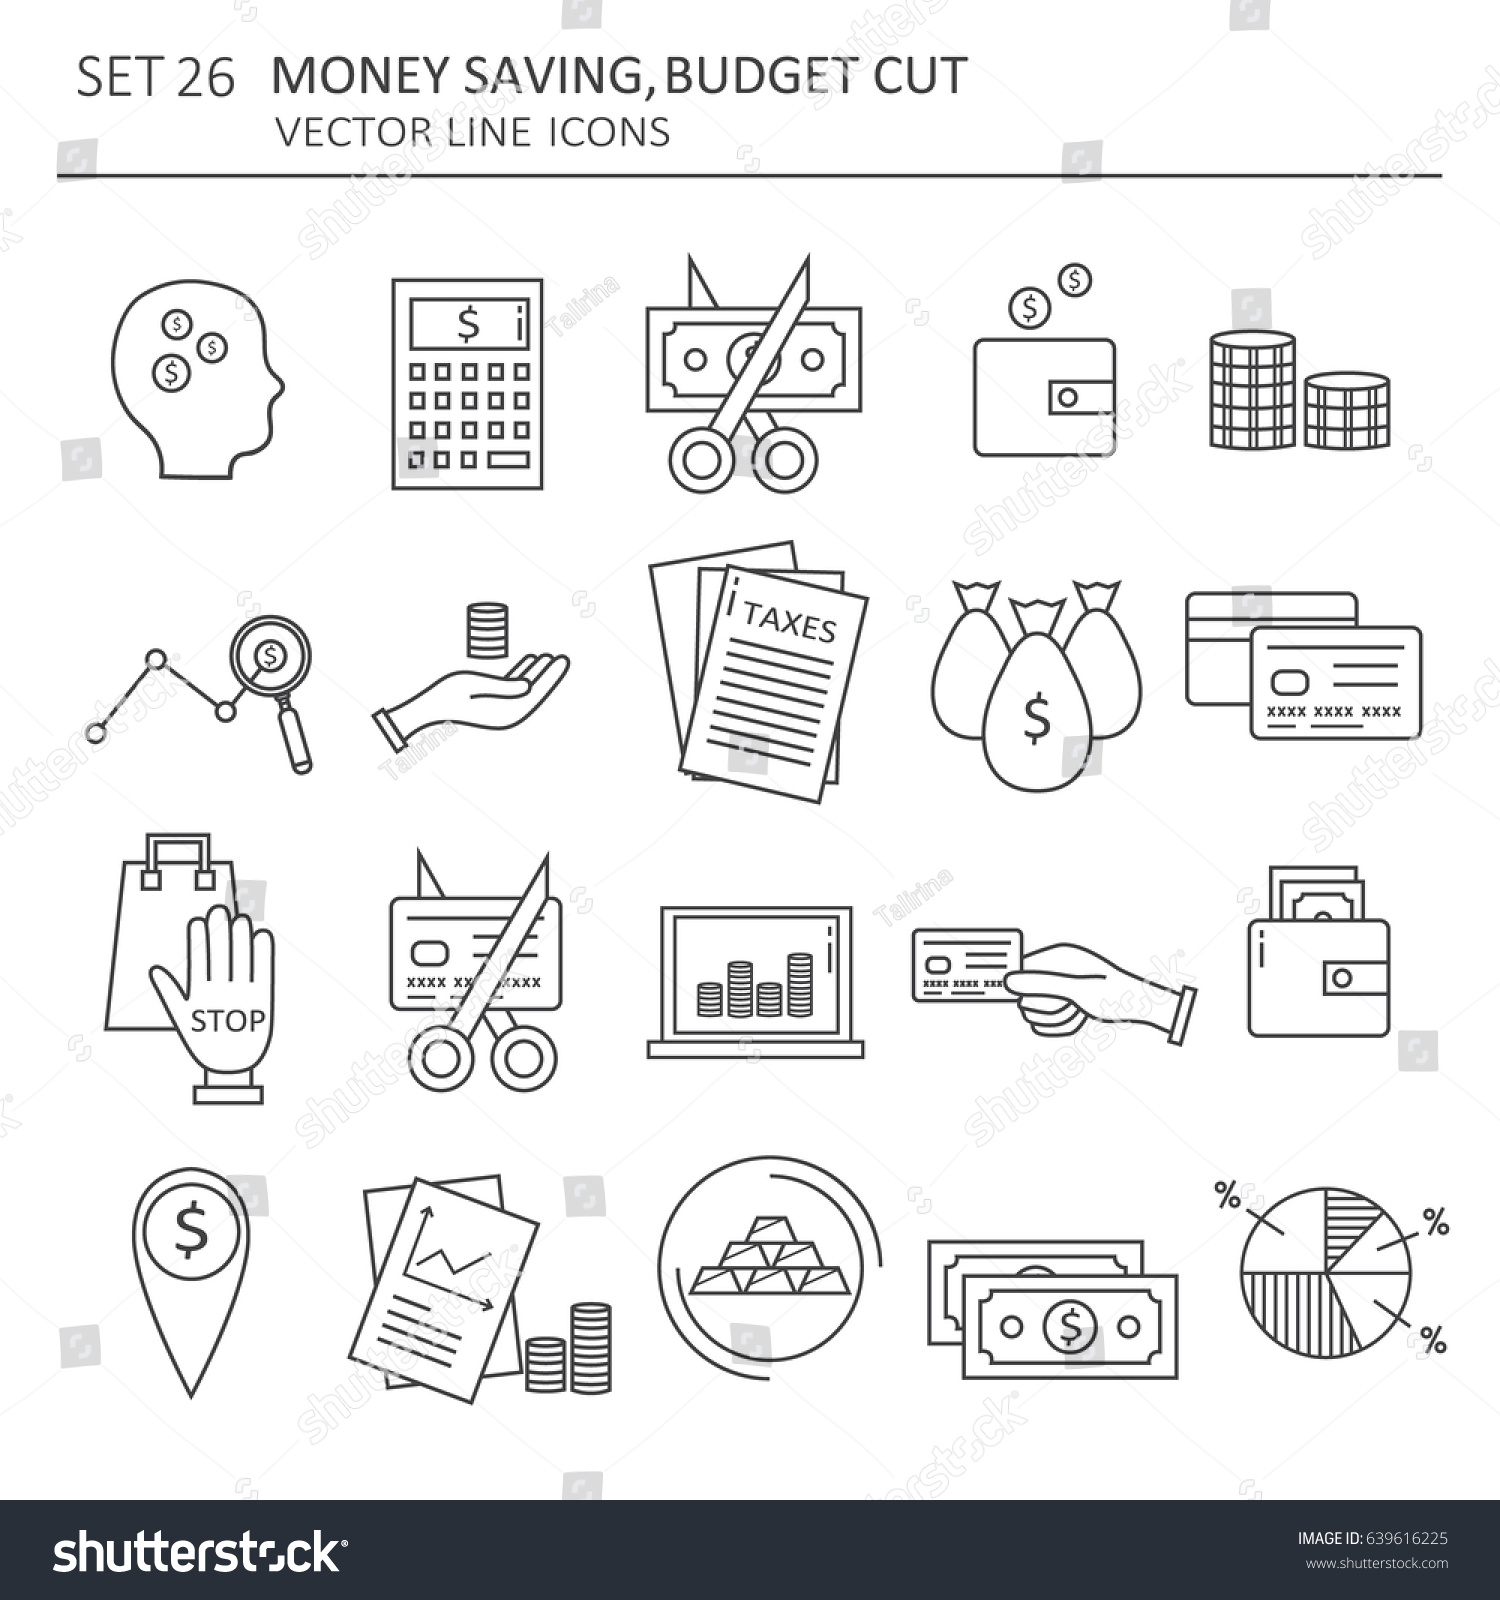 Set Symbols Money Saving Modern Flat Stock Vector 639616225